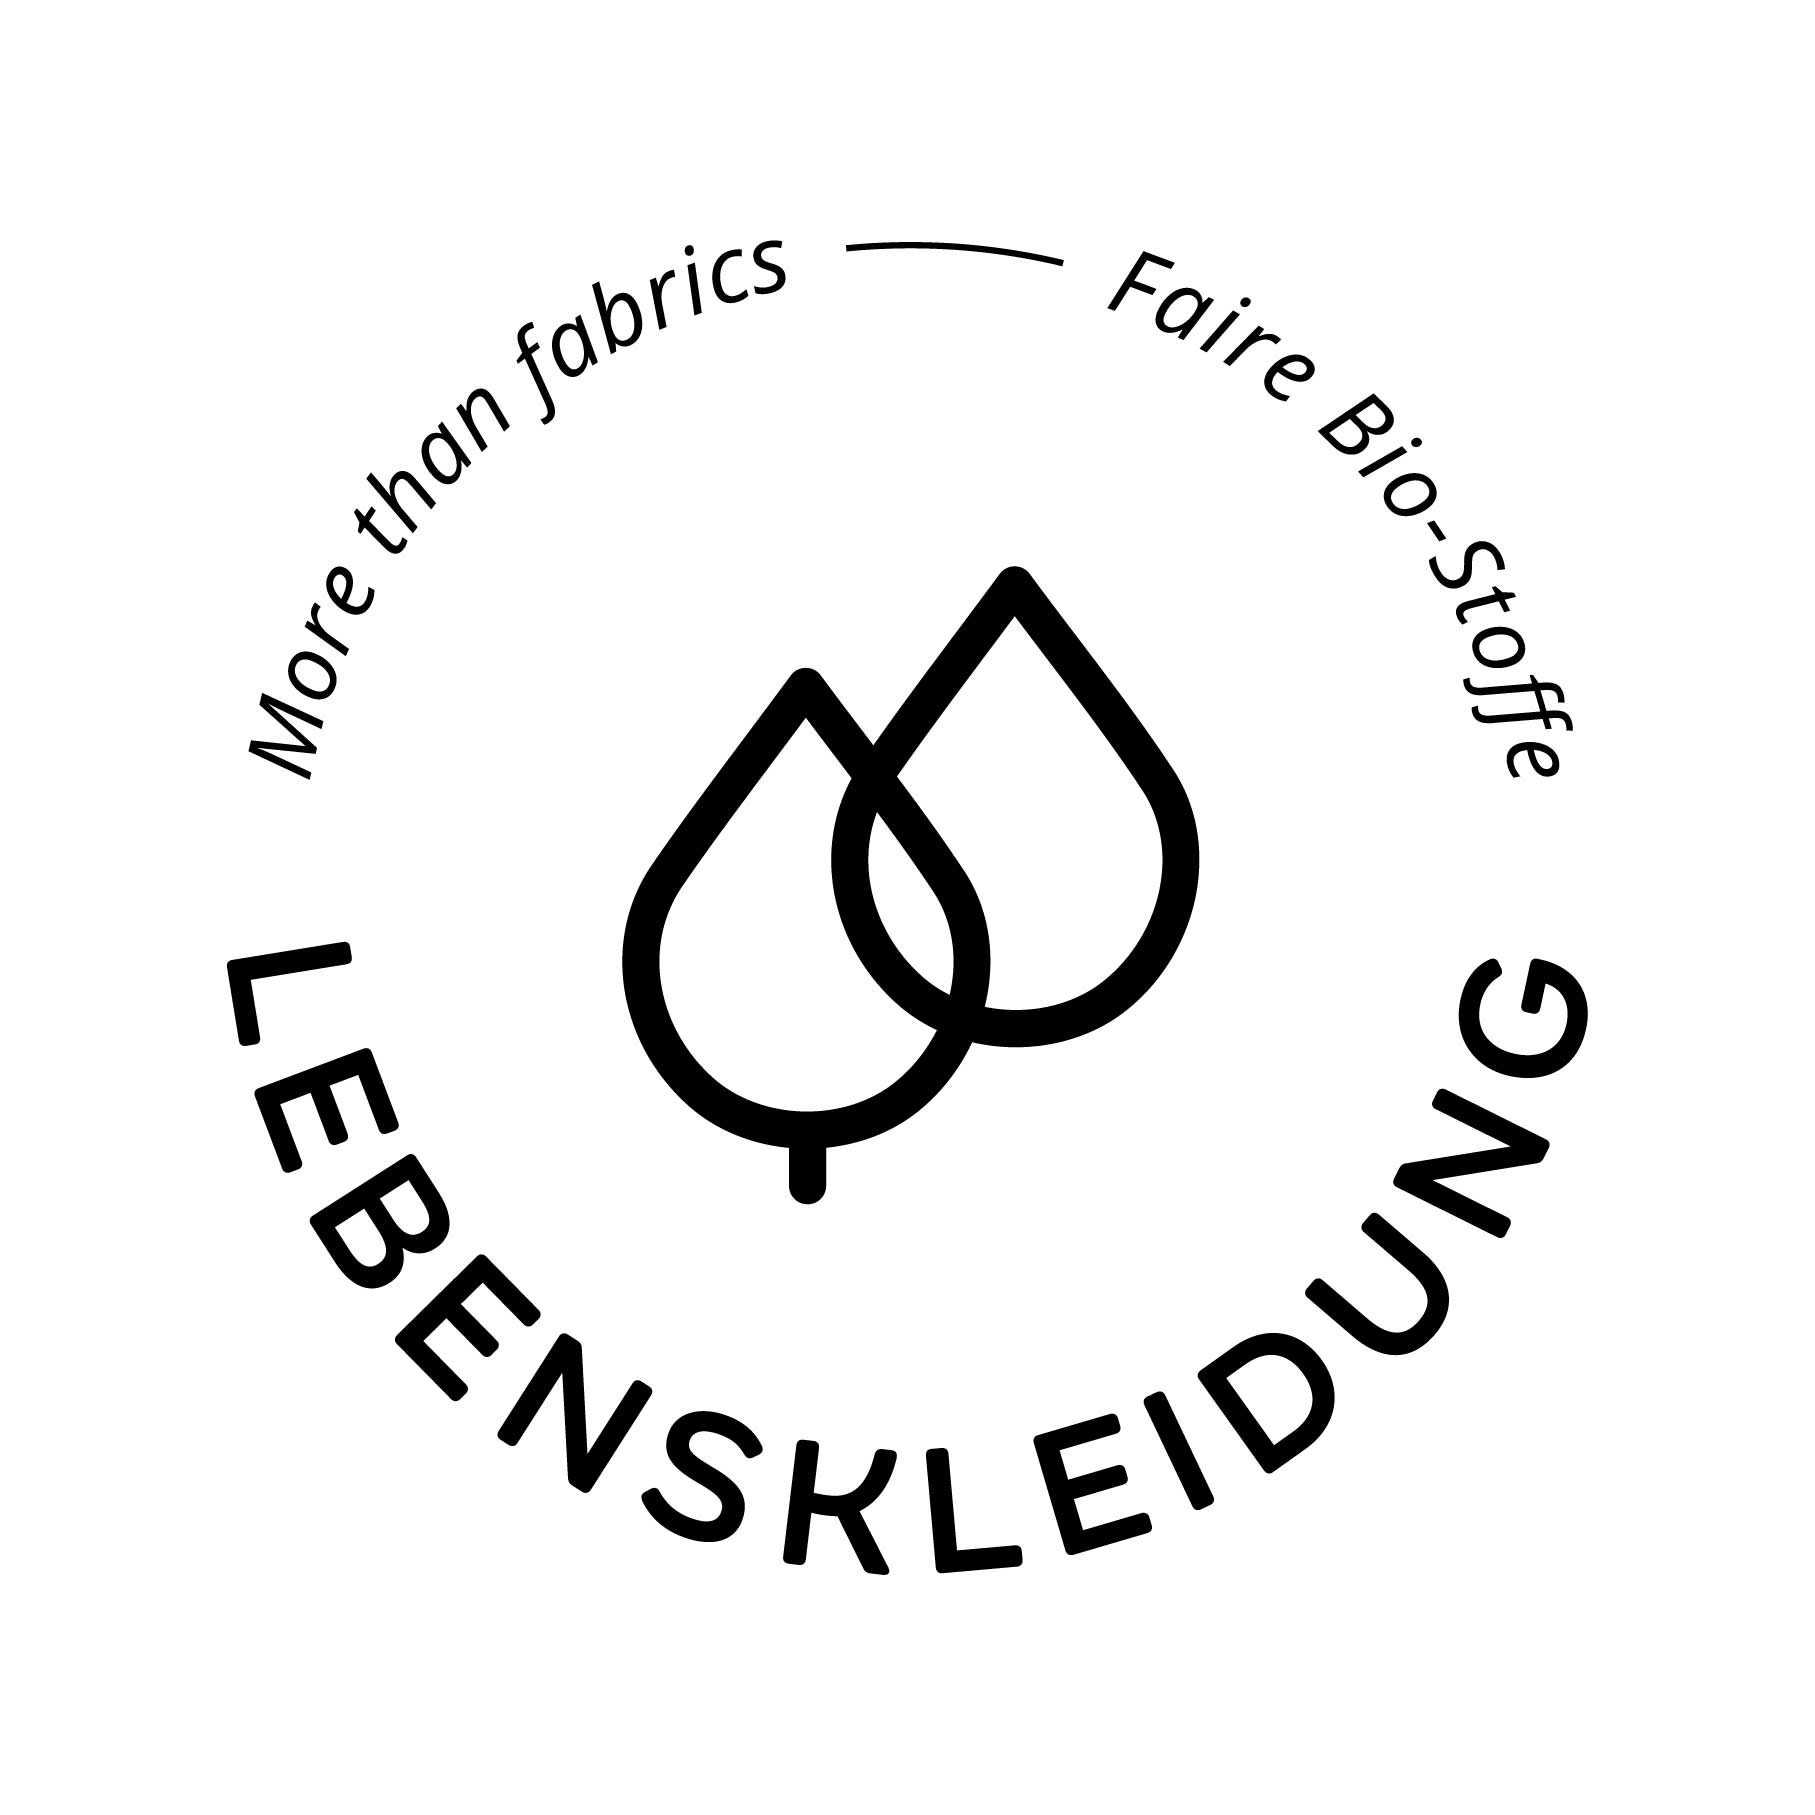 Campioni di colori di Rib 2x1-1